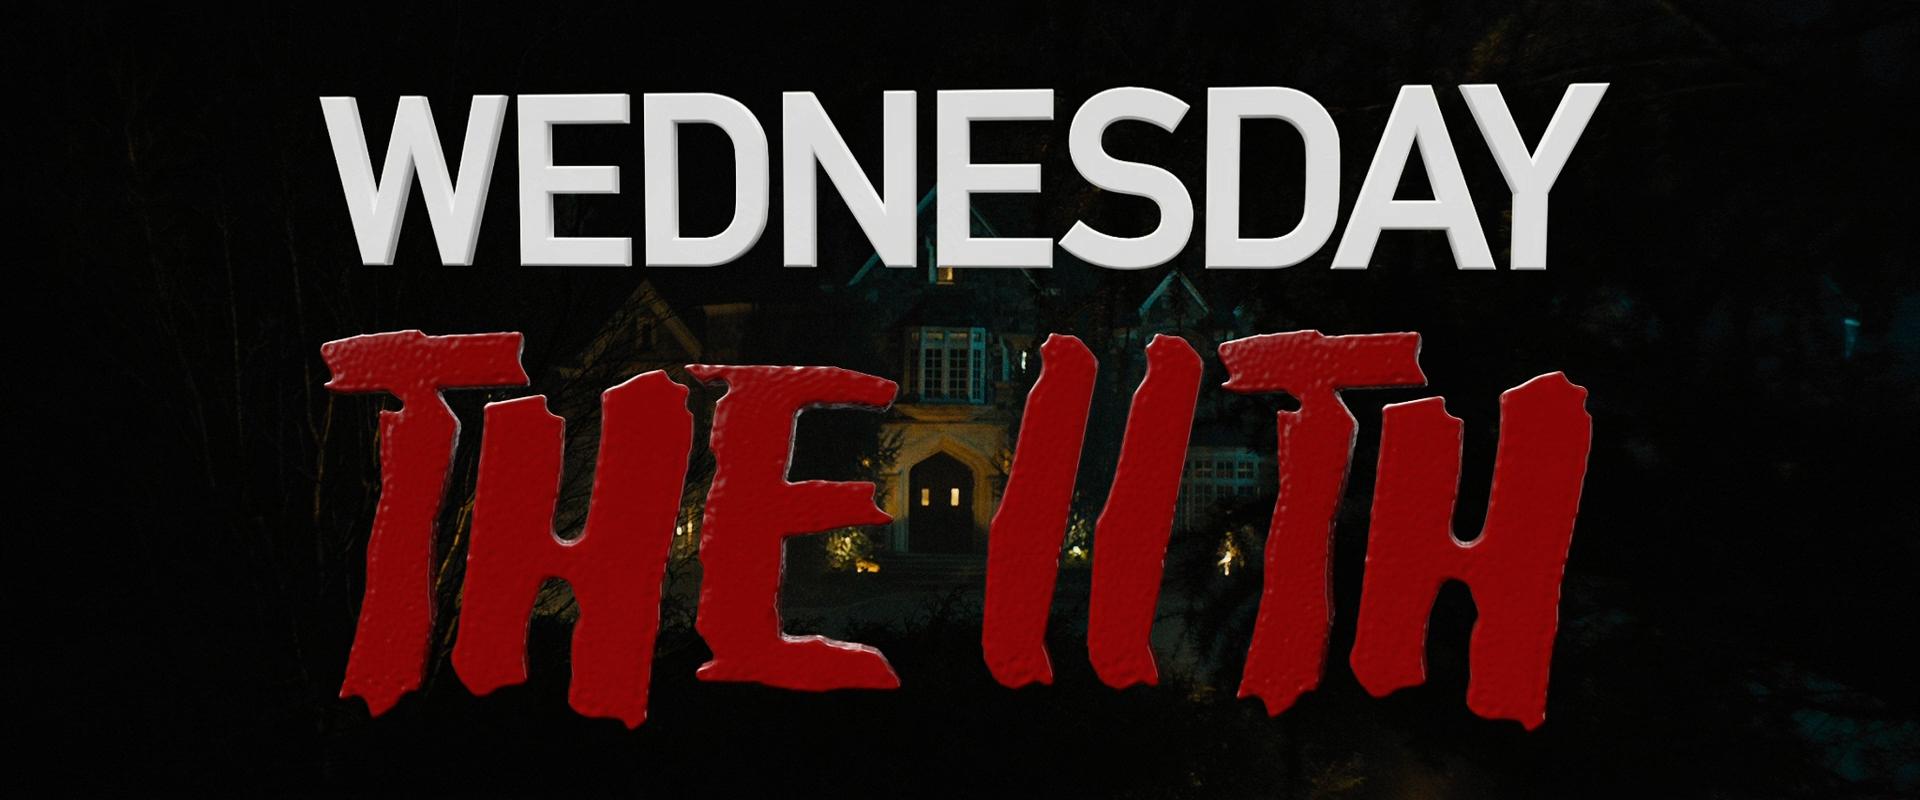 Freaky: Este cuerpo está para matar (2020) 1080p WEB-DL AMZN Latino